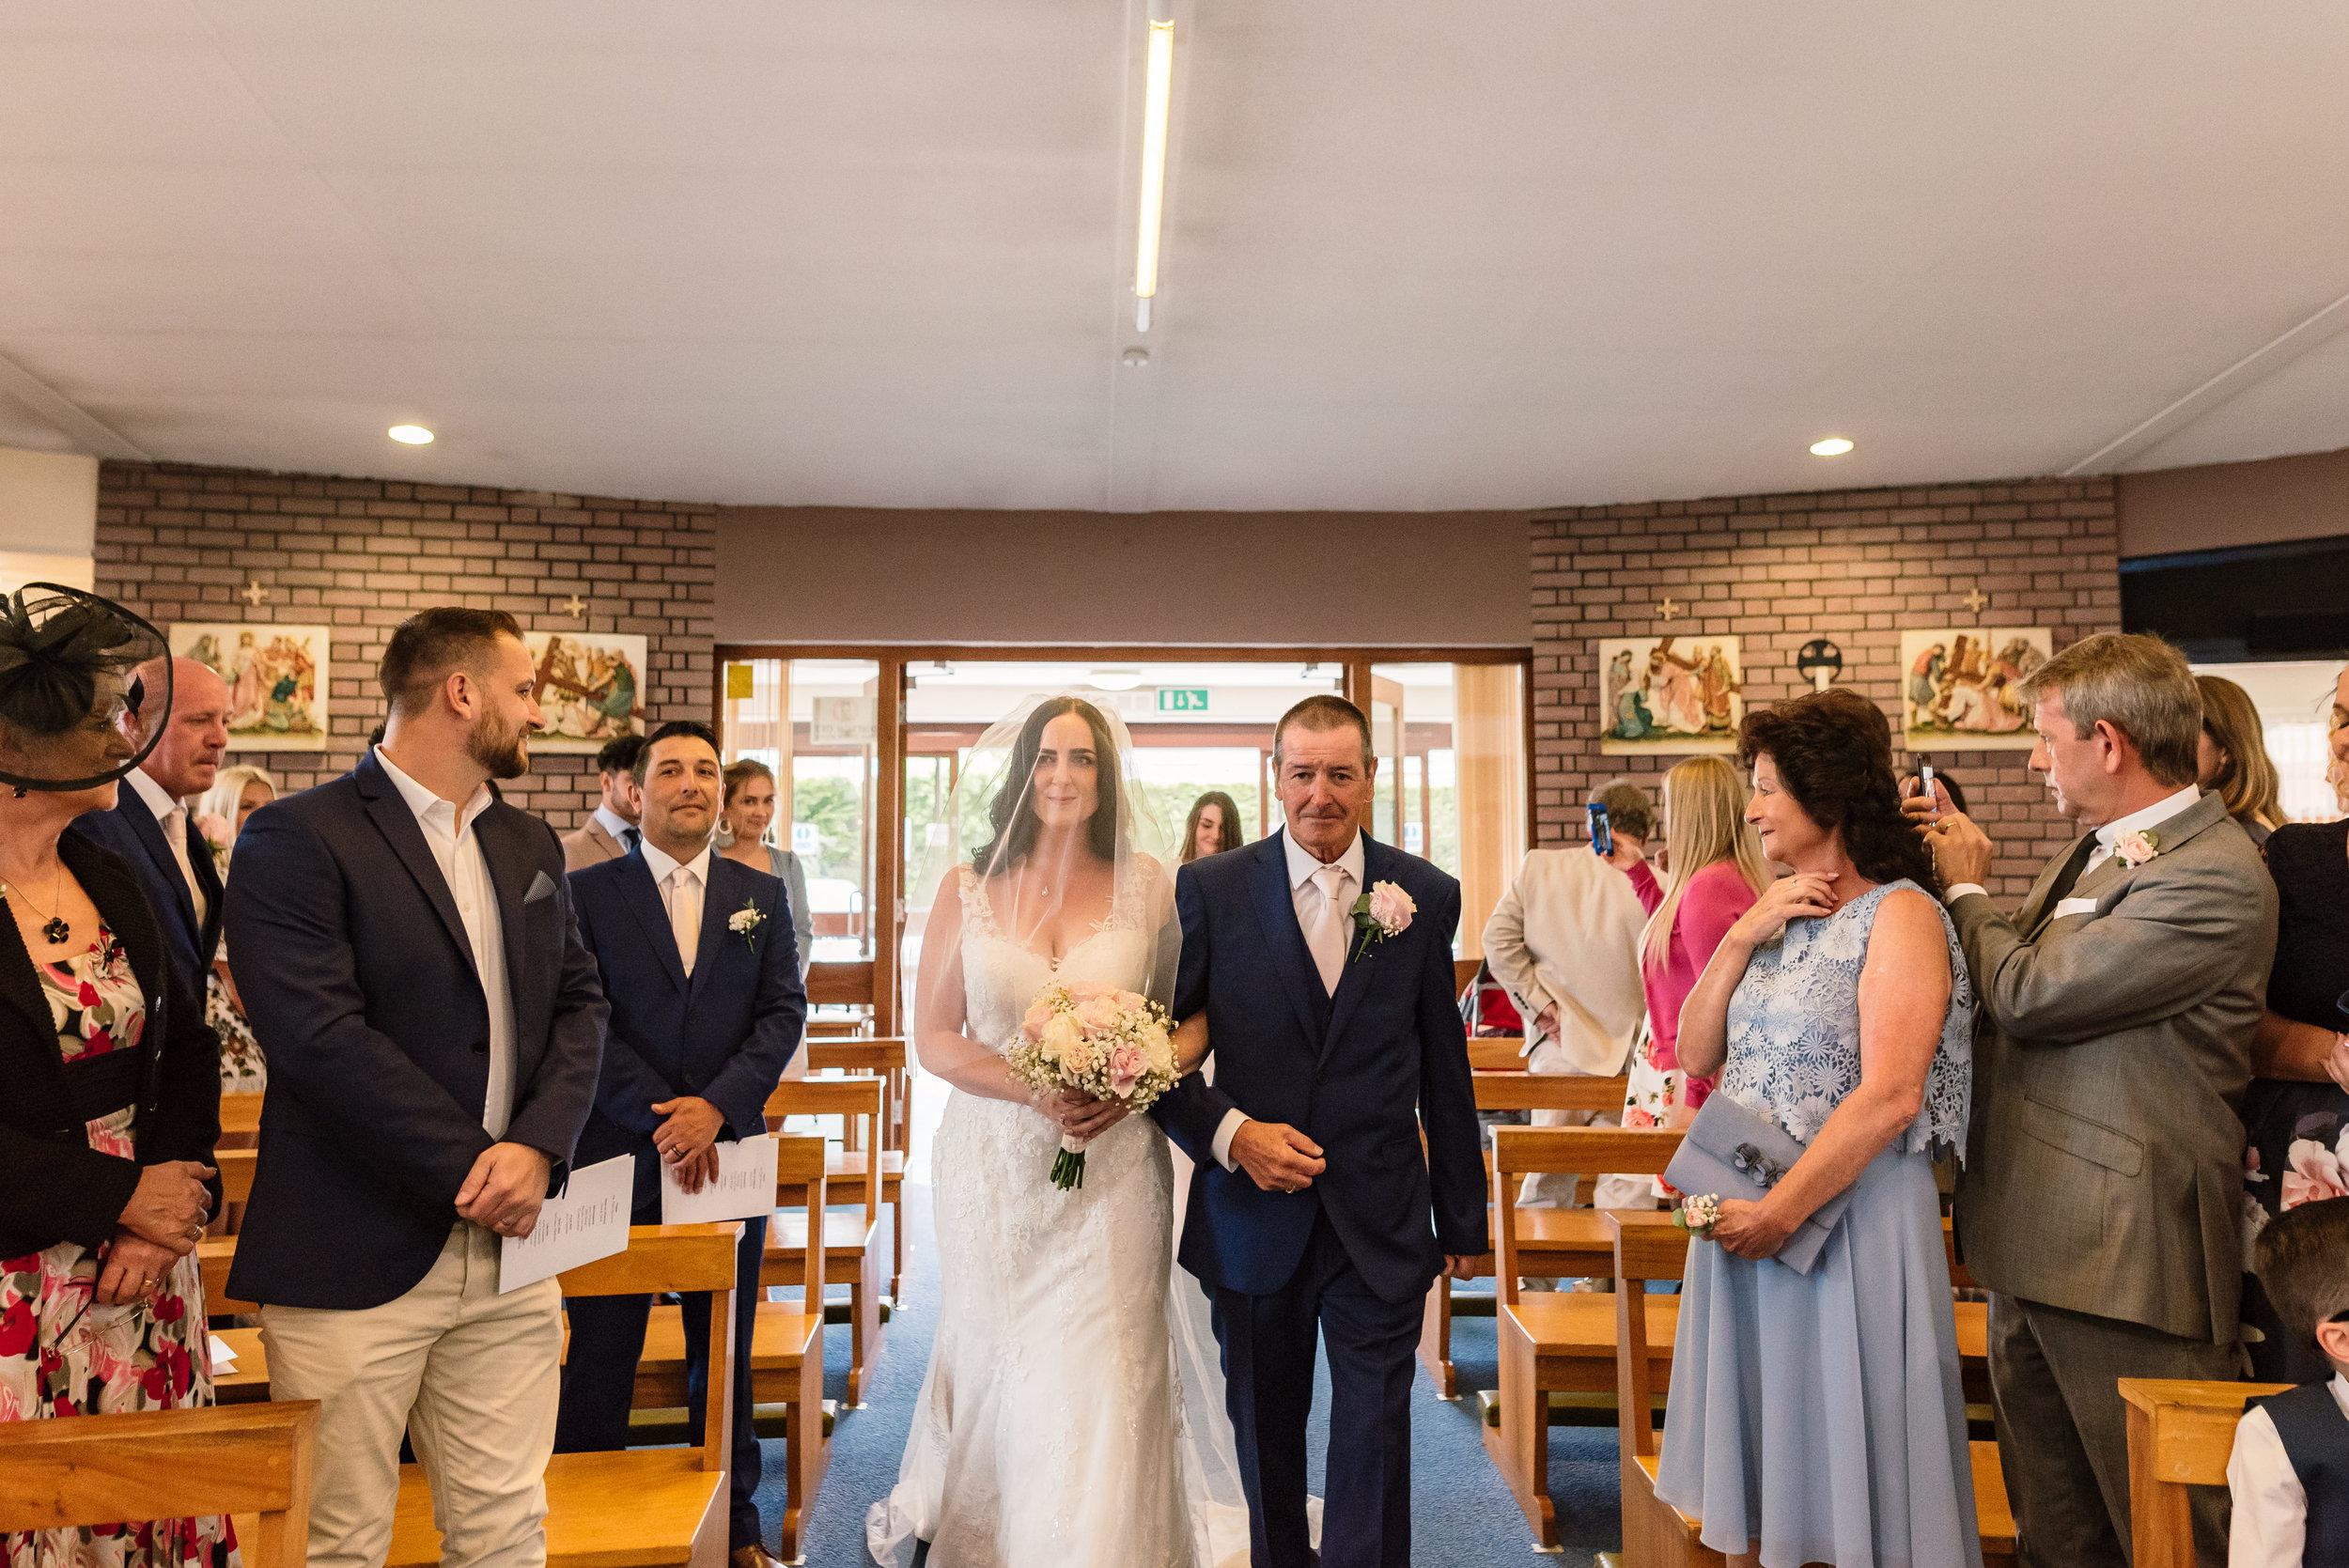 Sarah-Fishlock-Photography : Hampshire-wedding-photographer-hampshire : fleet-wedding-photographer-fleet : Meade-Hall-Wedding-Photographer : Meade-Hall-Wedding-Photos-429.jpg